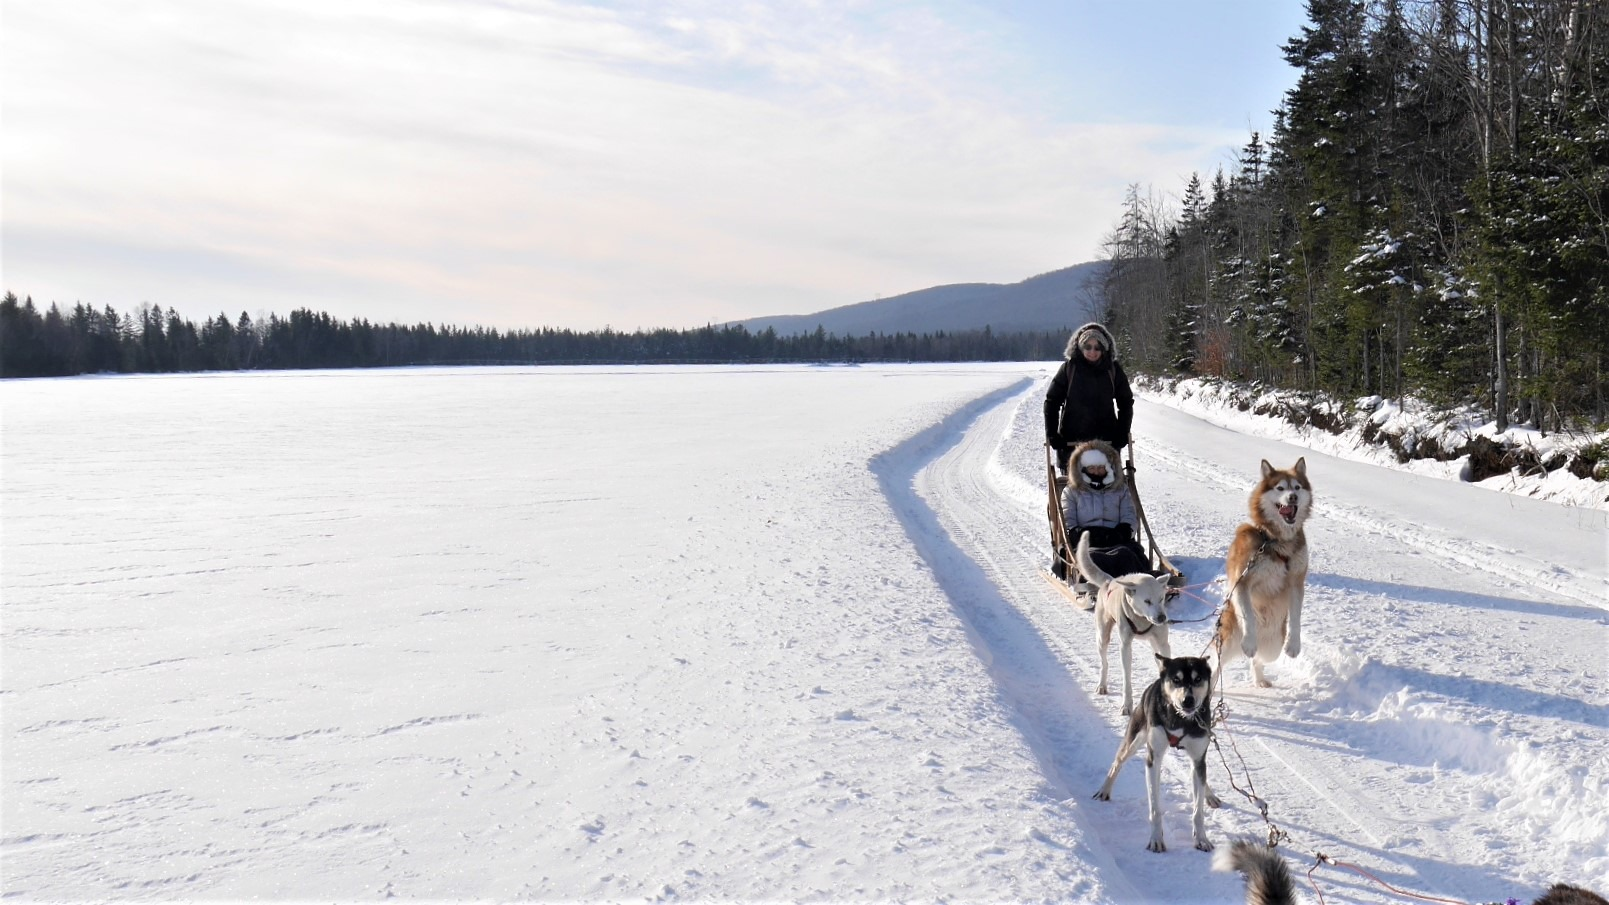 Quebec Station touristique duchesnay aventure inukshuk blog voyage canada hiver arpenter le chemin